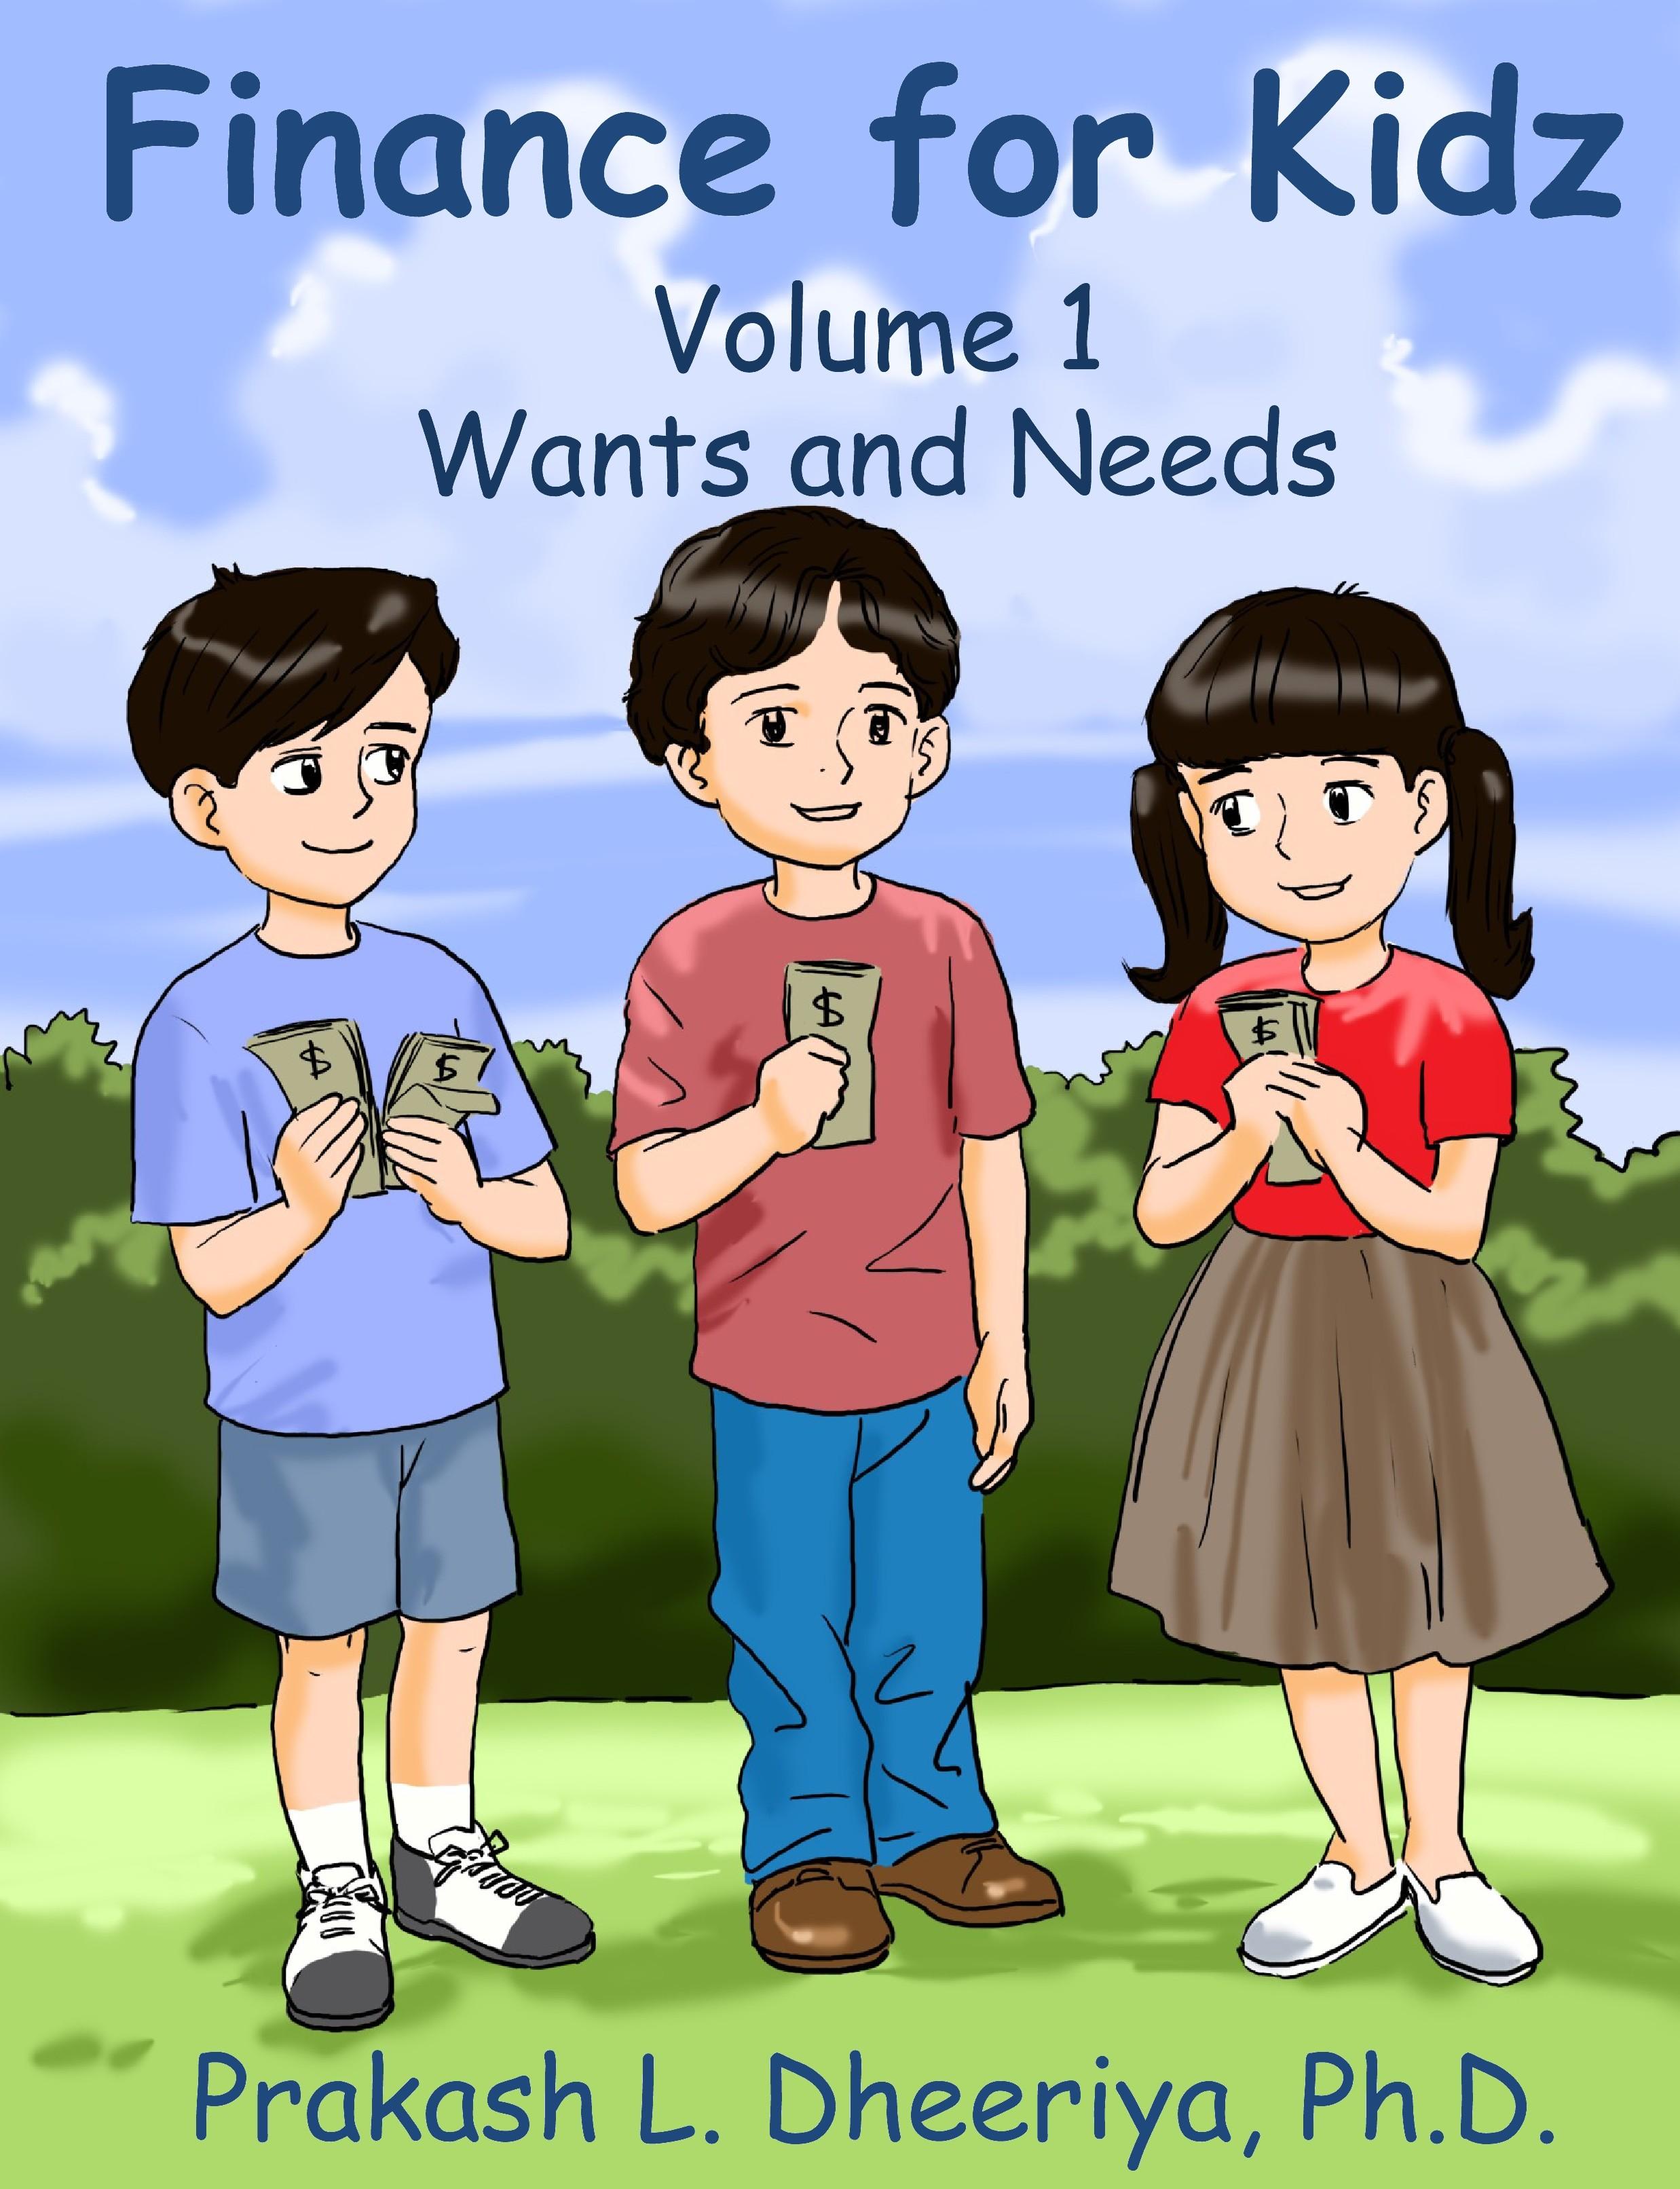 Finance for Kidz: Wants & Needs